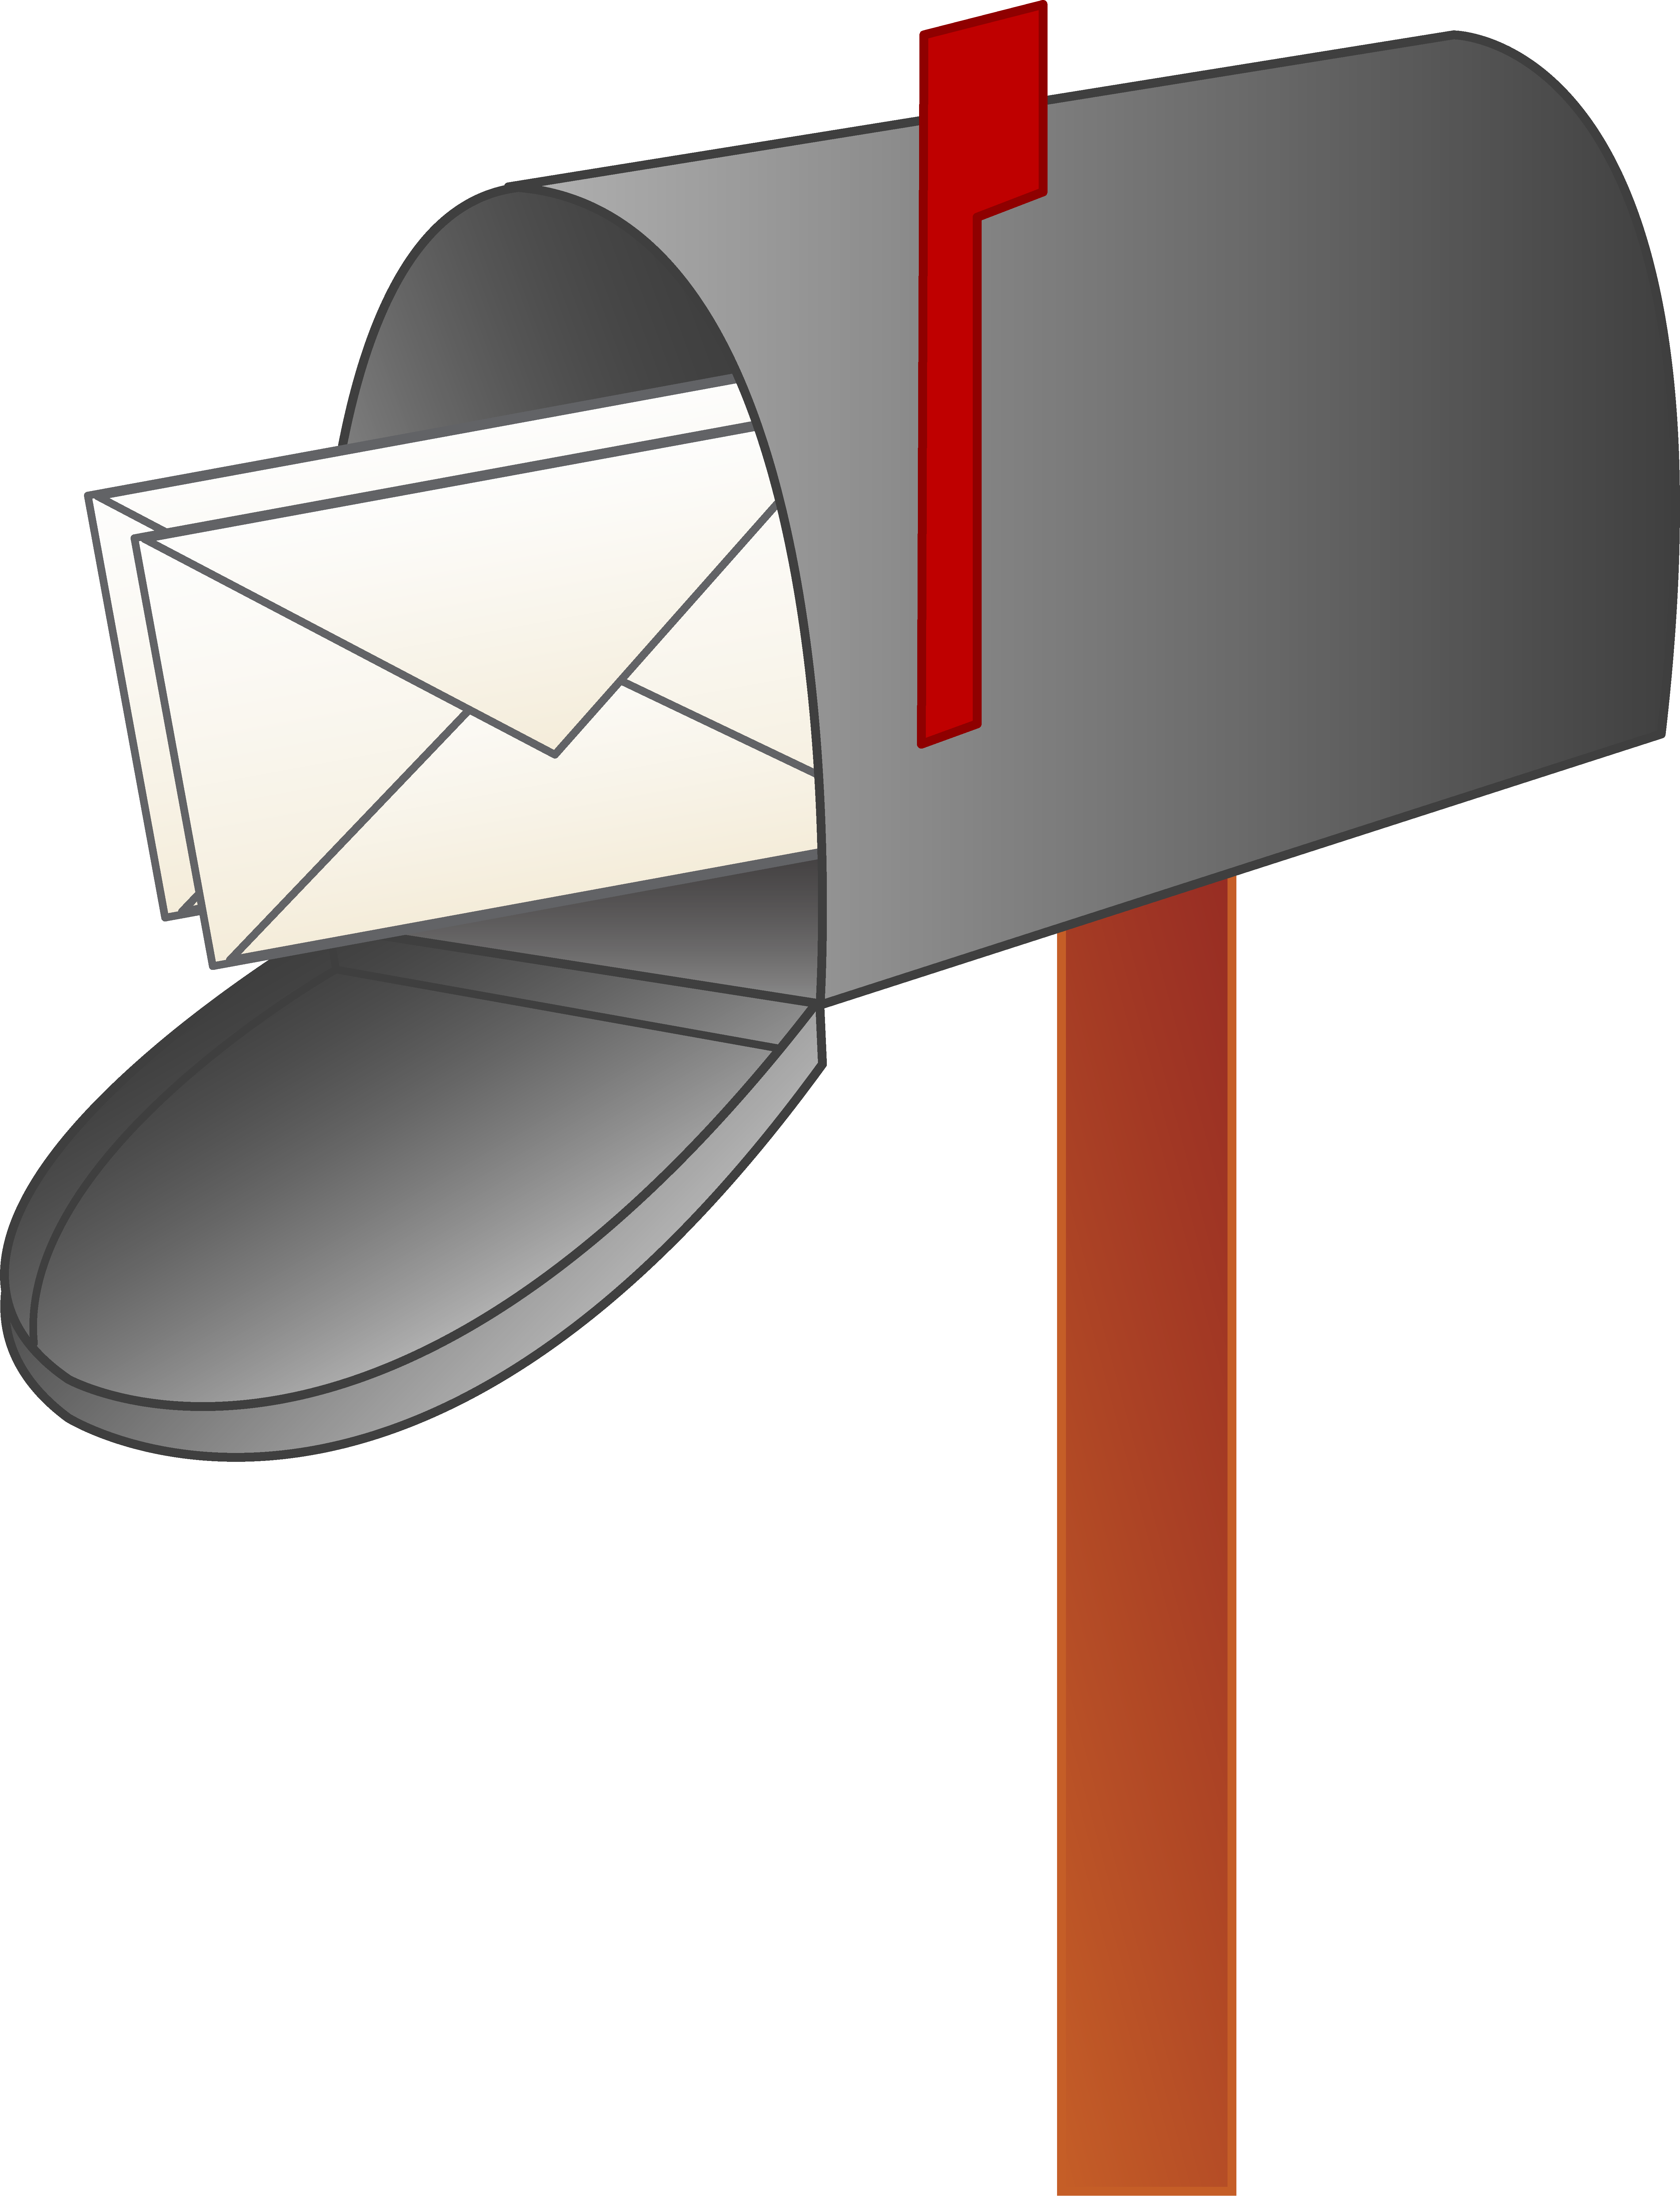 Old Letter clipart writing letter Clip clip art tumundografico 5